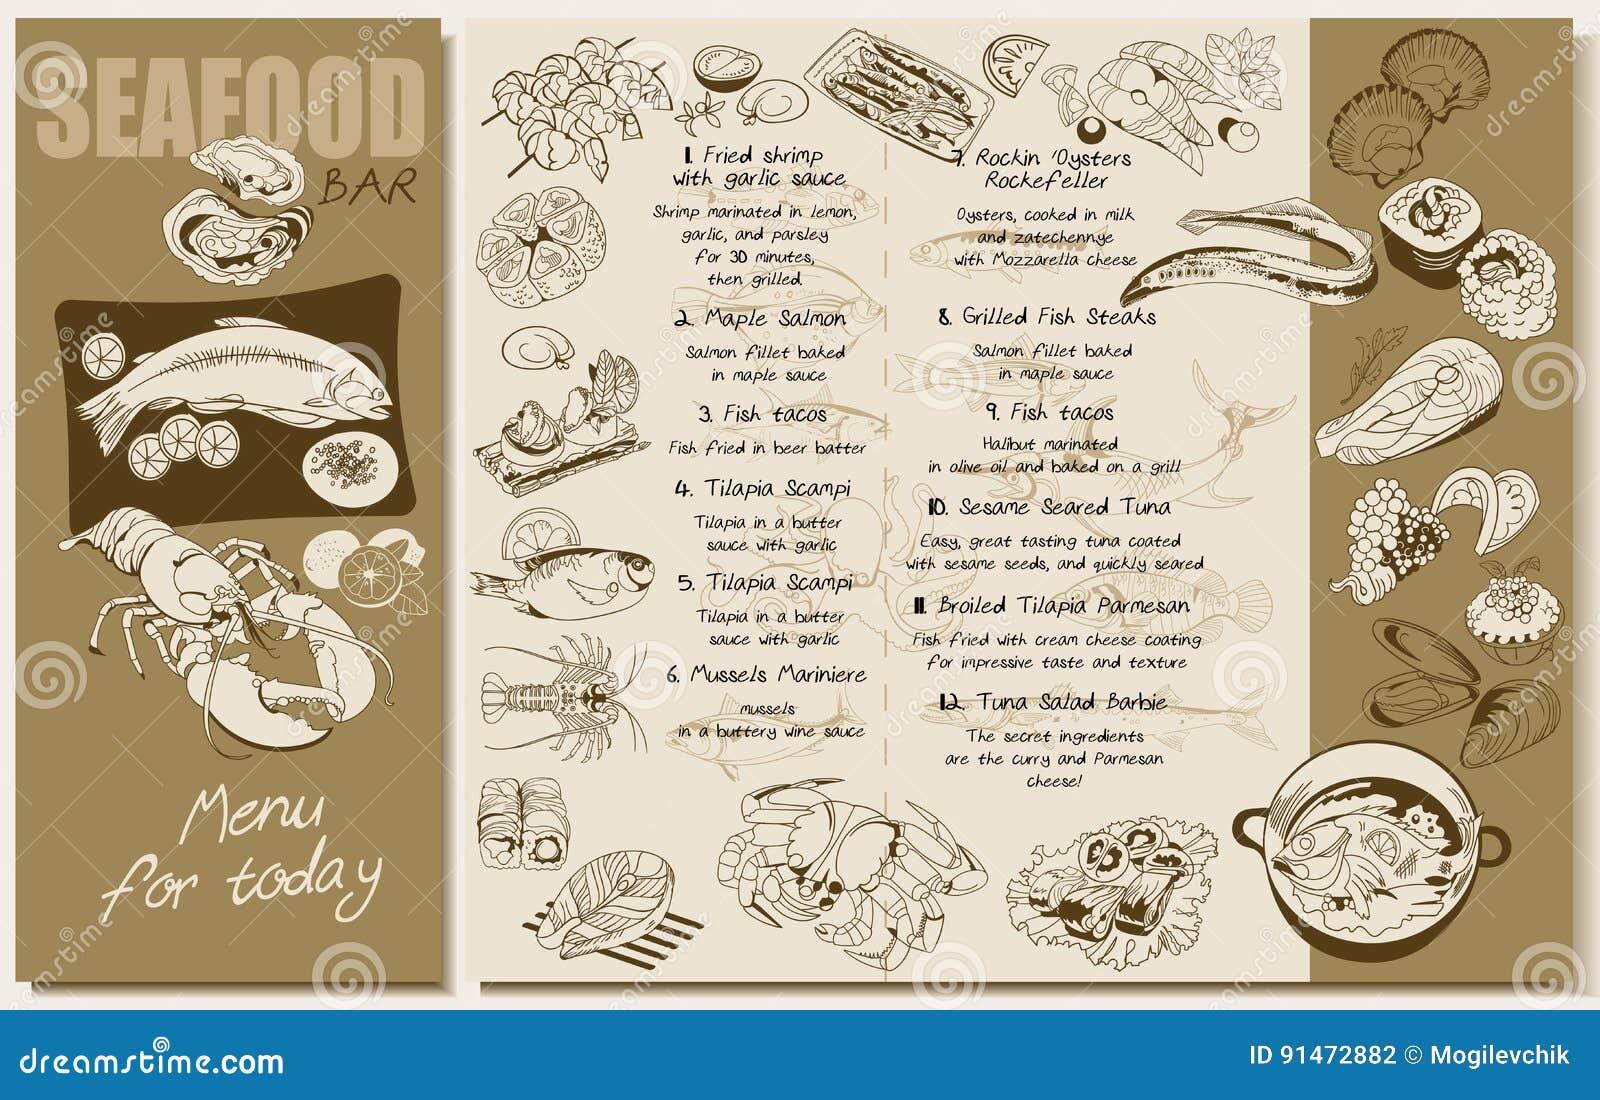 sketch seafood restaurant menu template stock vector. Black Bedroom Furniture Sets. Home Design Ideas